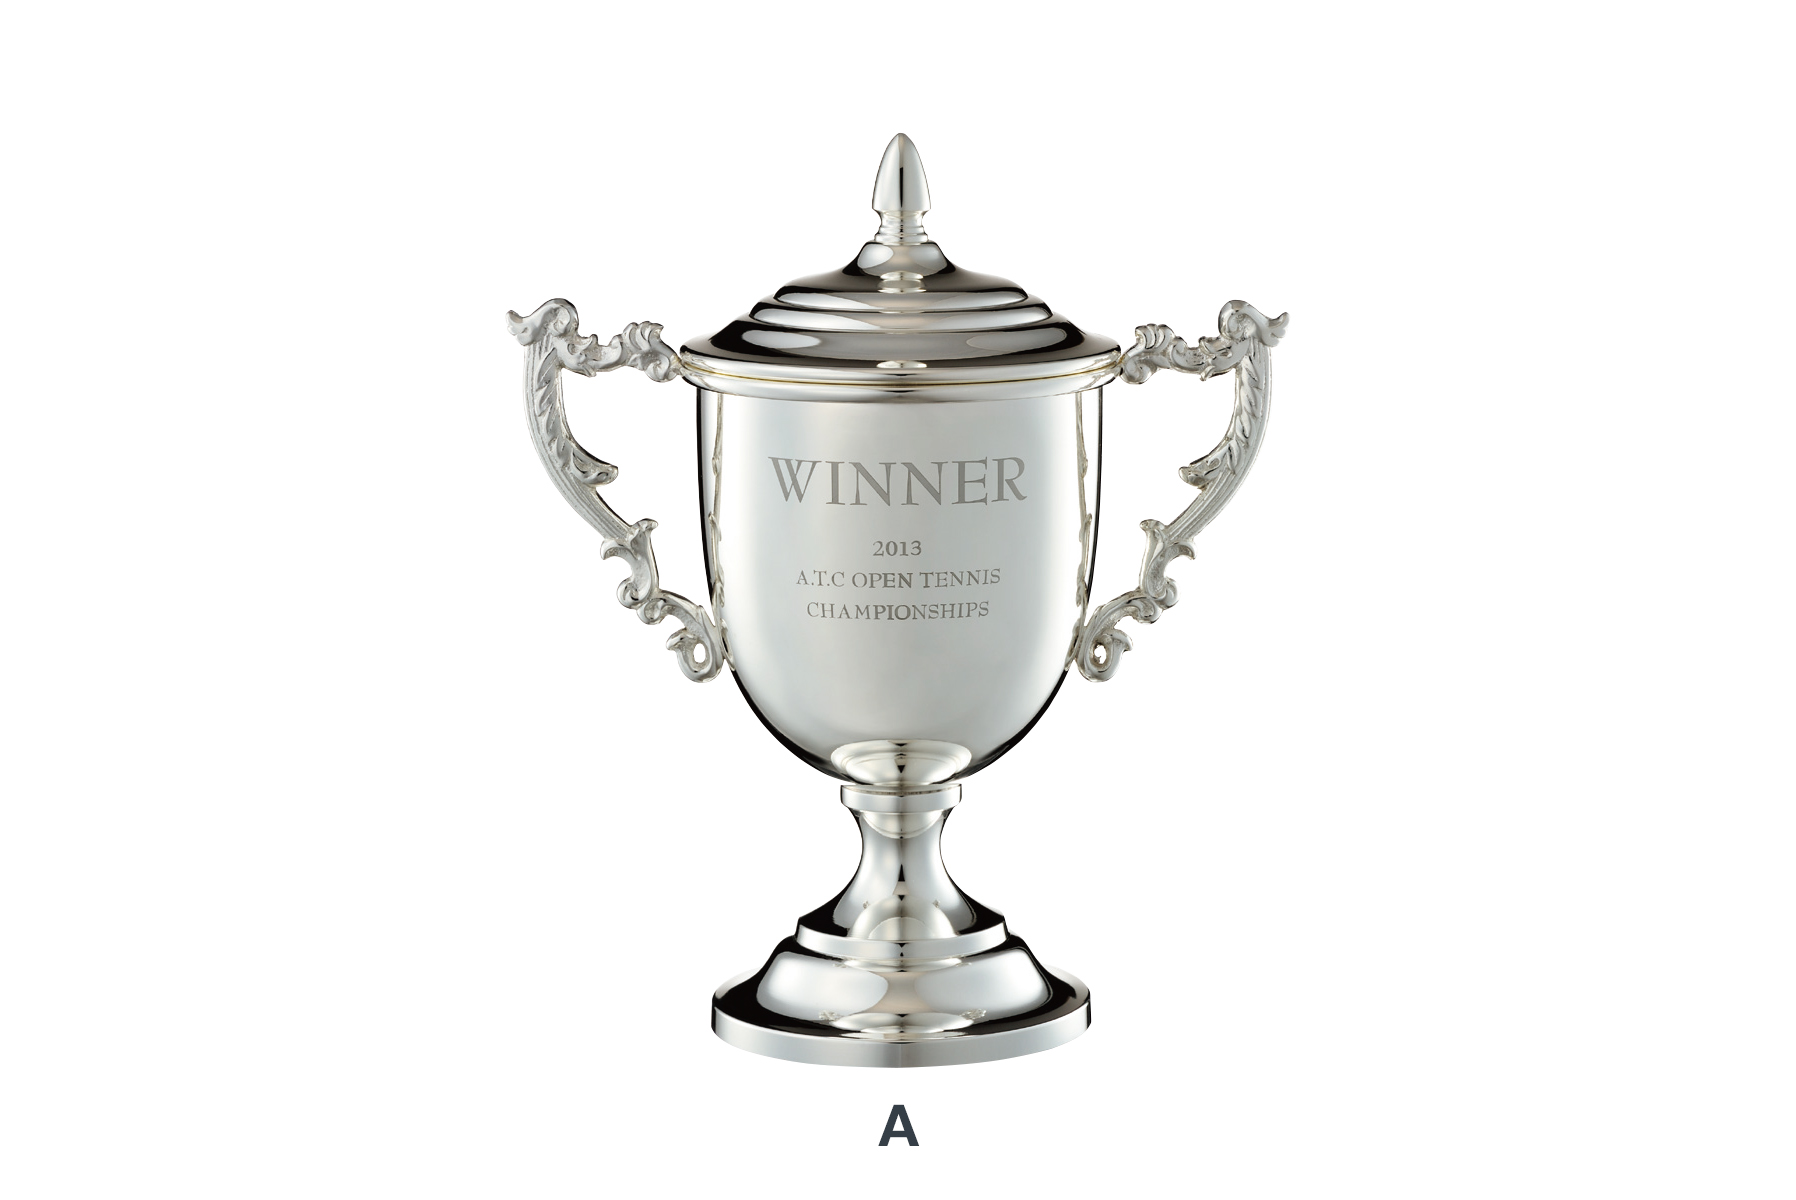 JV-VOC-170 カップに直接オリジナル彫刻が可能なシーンを選ばない高級優勝カップ